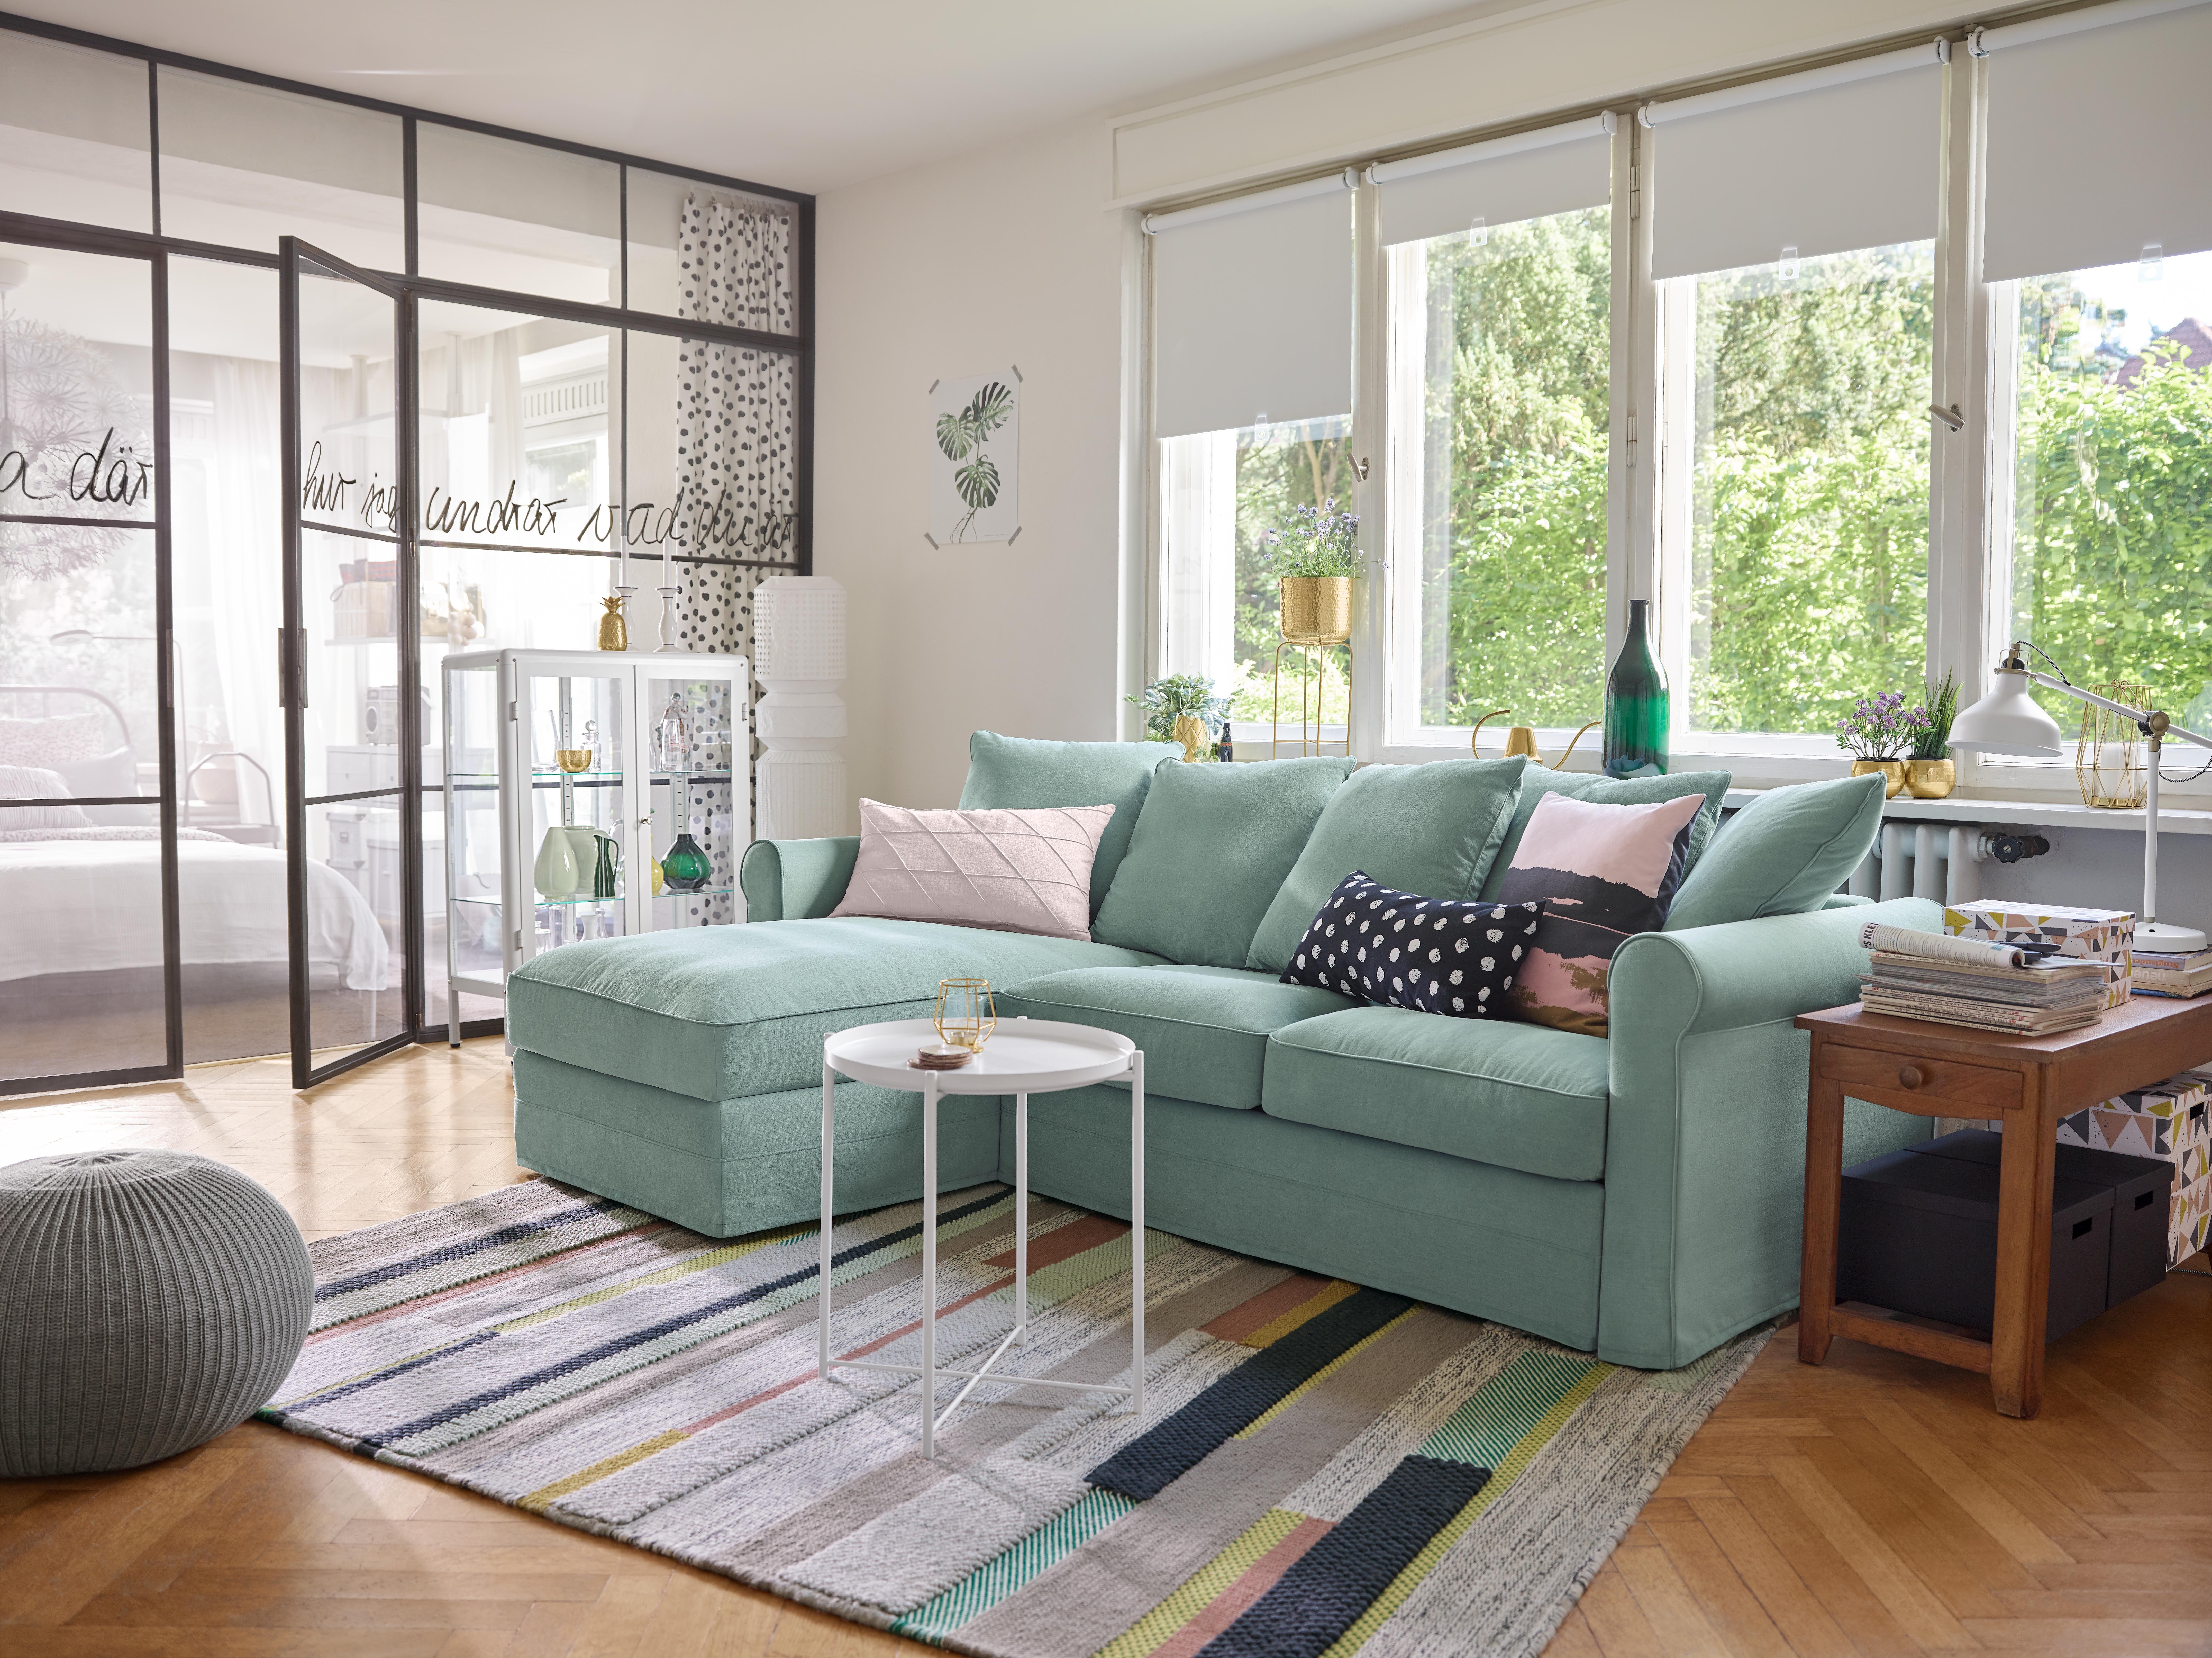 Photo of GRÖNLID 3-seat sofa – Ljungen light green – IKEA Germany